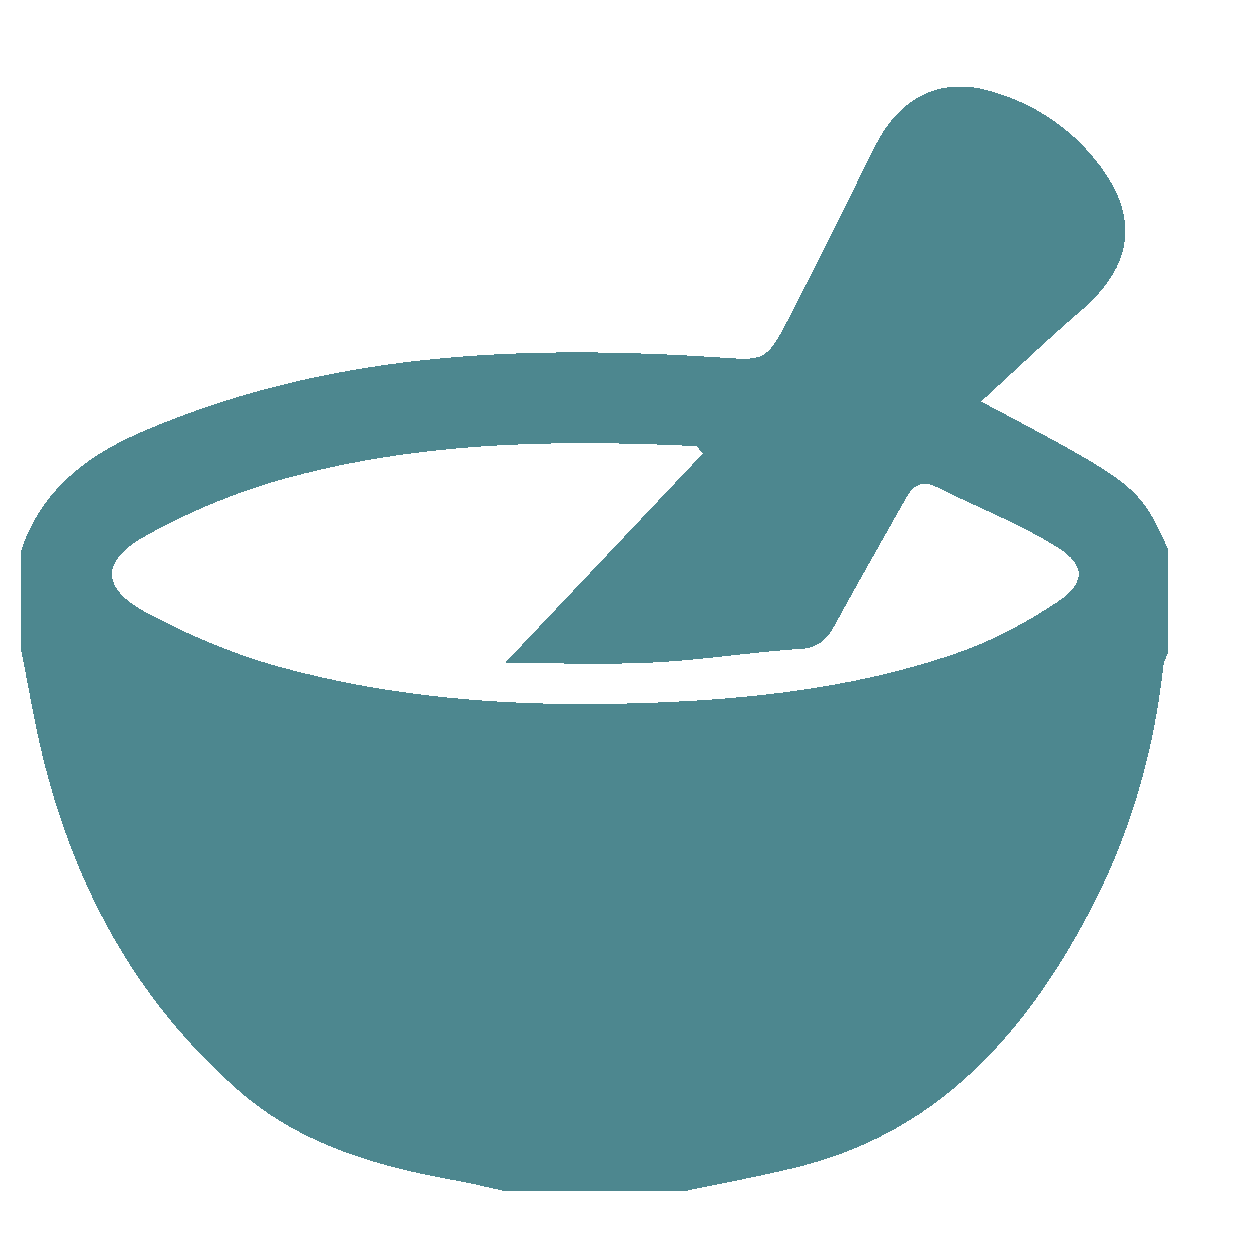 Ibuprofen loratadine health and. Medication clipart medicine cup